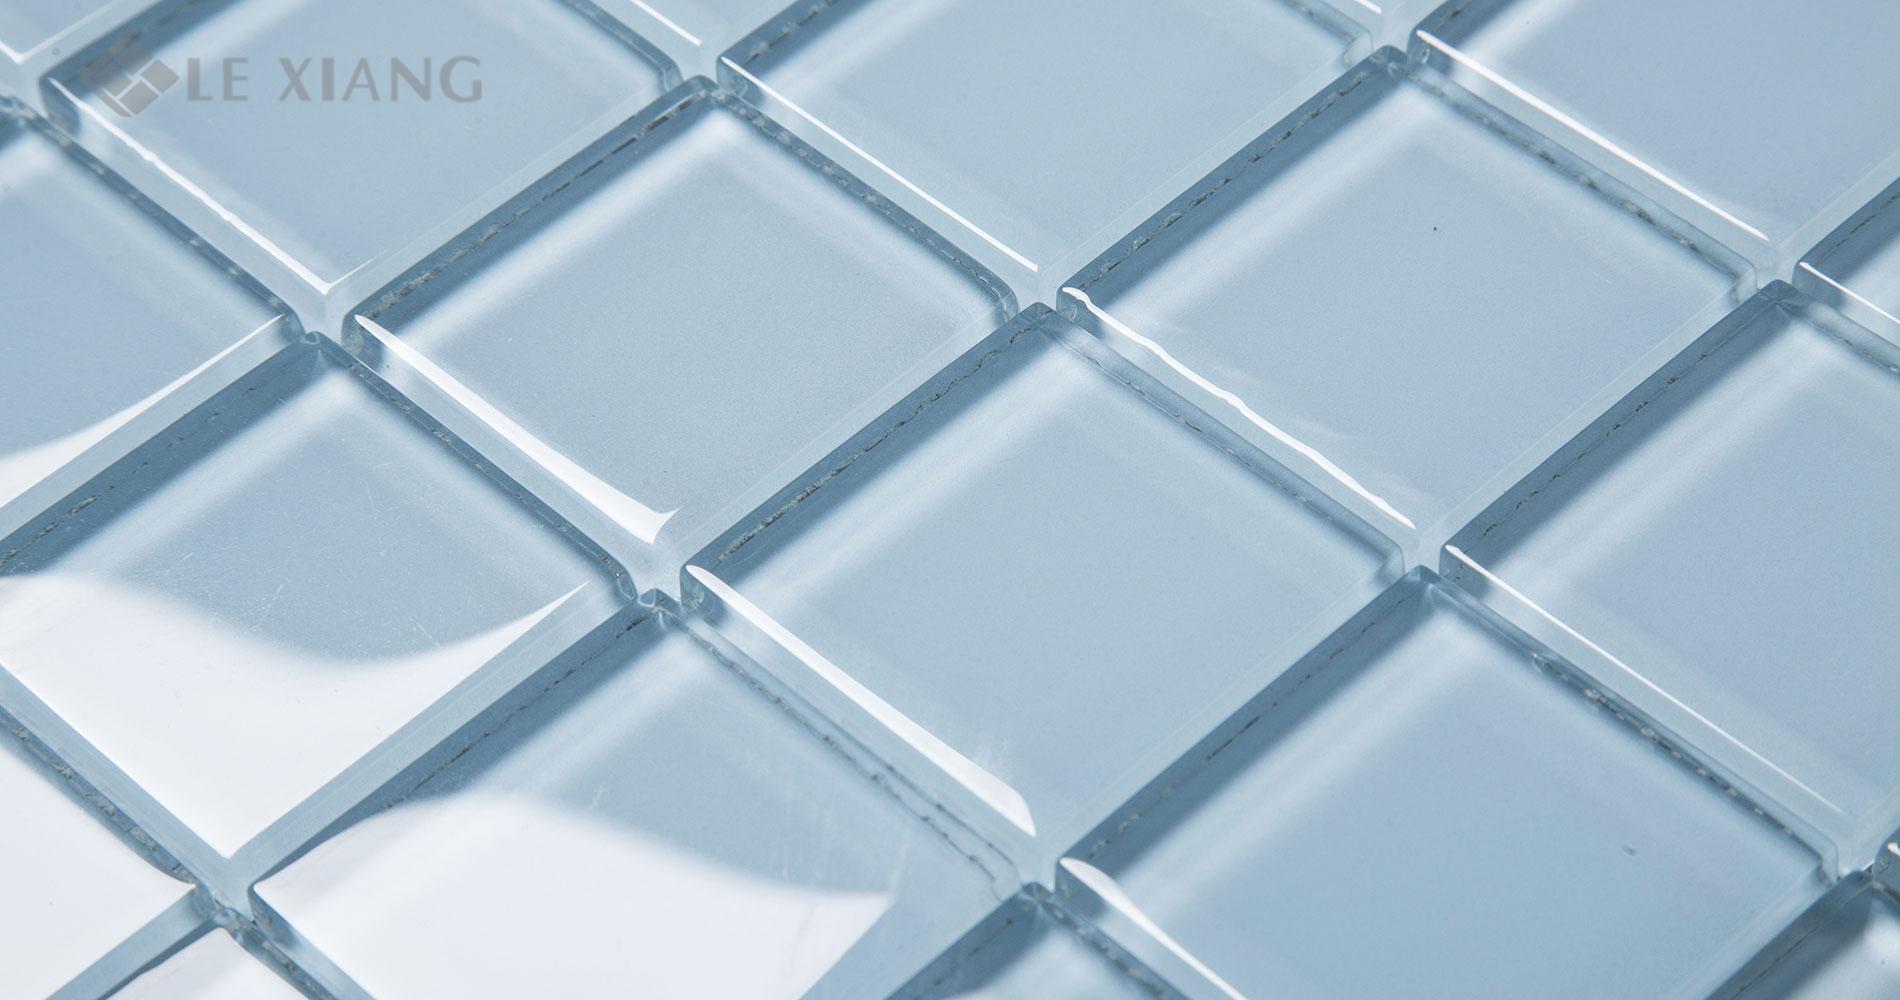 48mm-Square-Crystal-Glass-Mosaic-Backsplash-Tiles-19